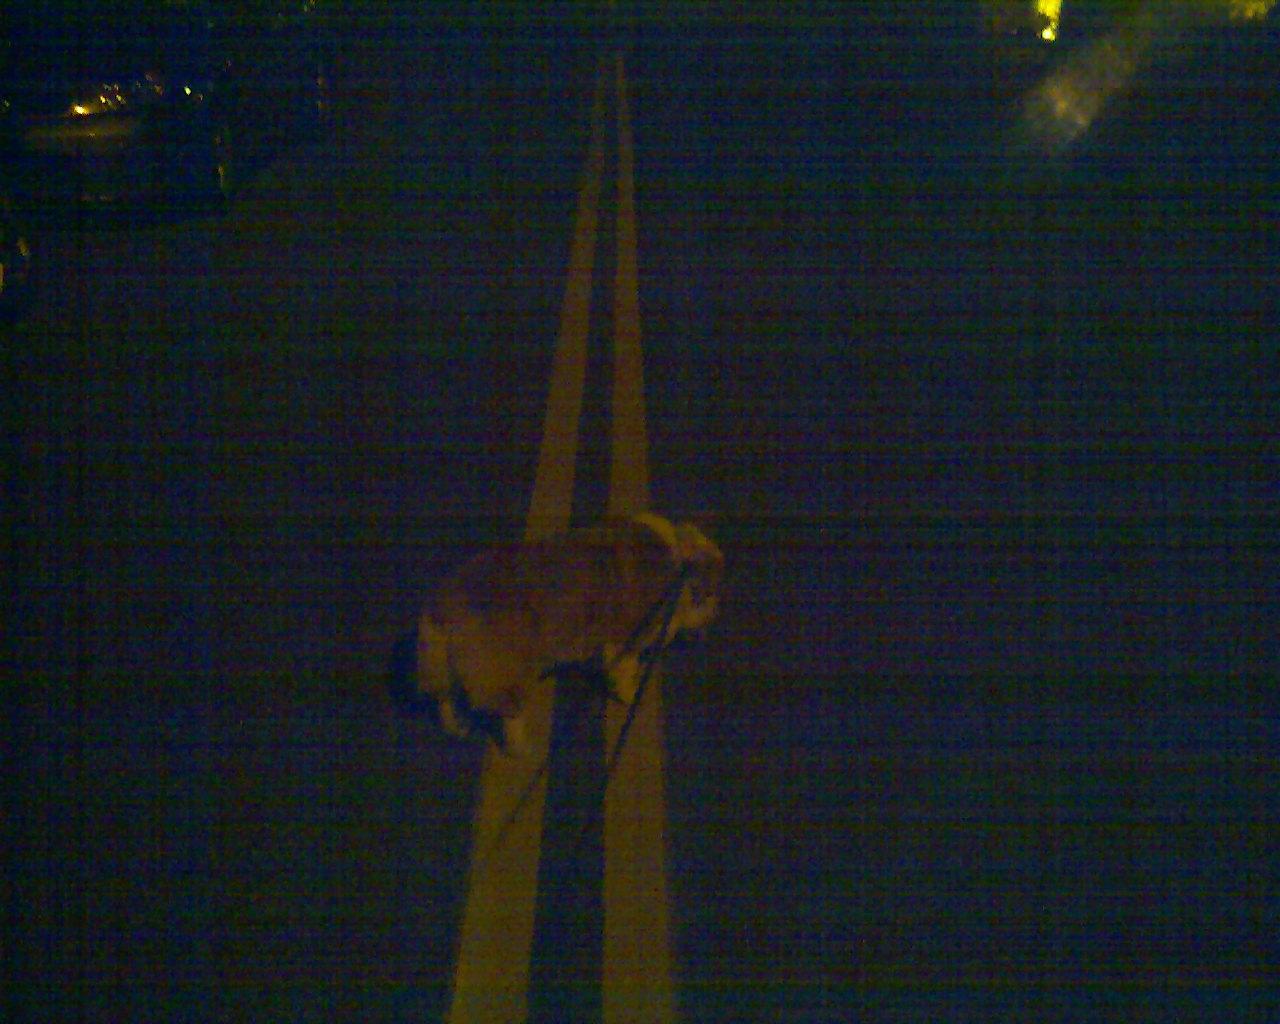 夜の散歩_e0147716_413289.jpg